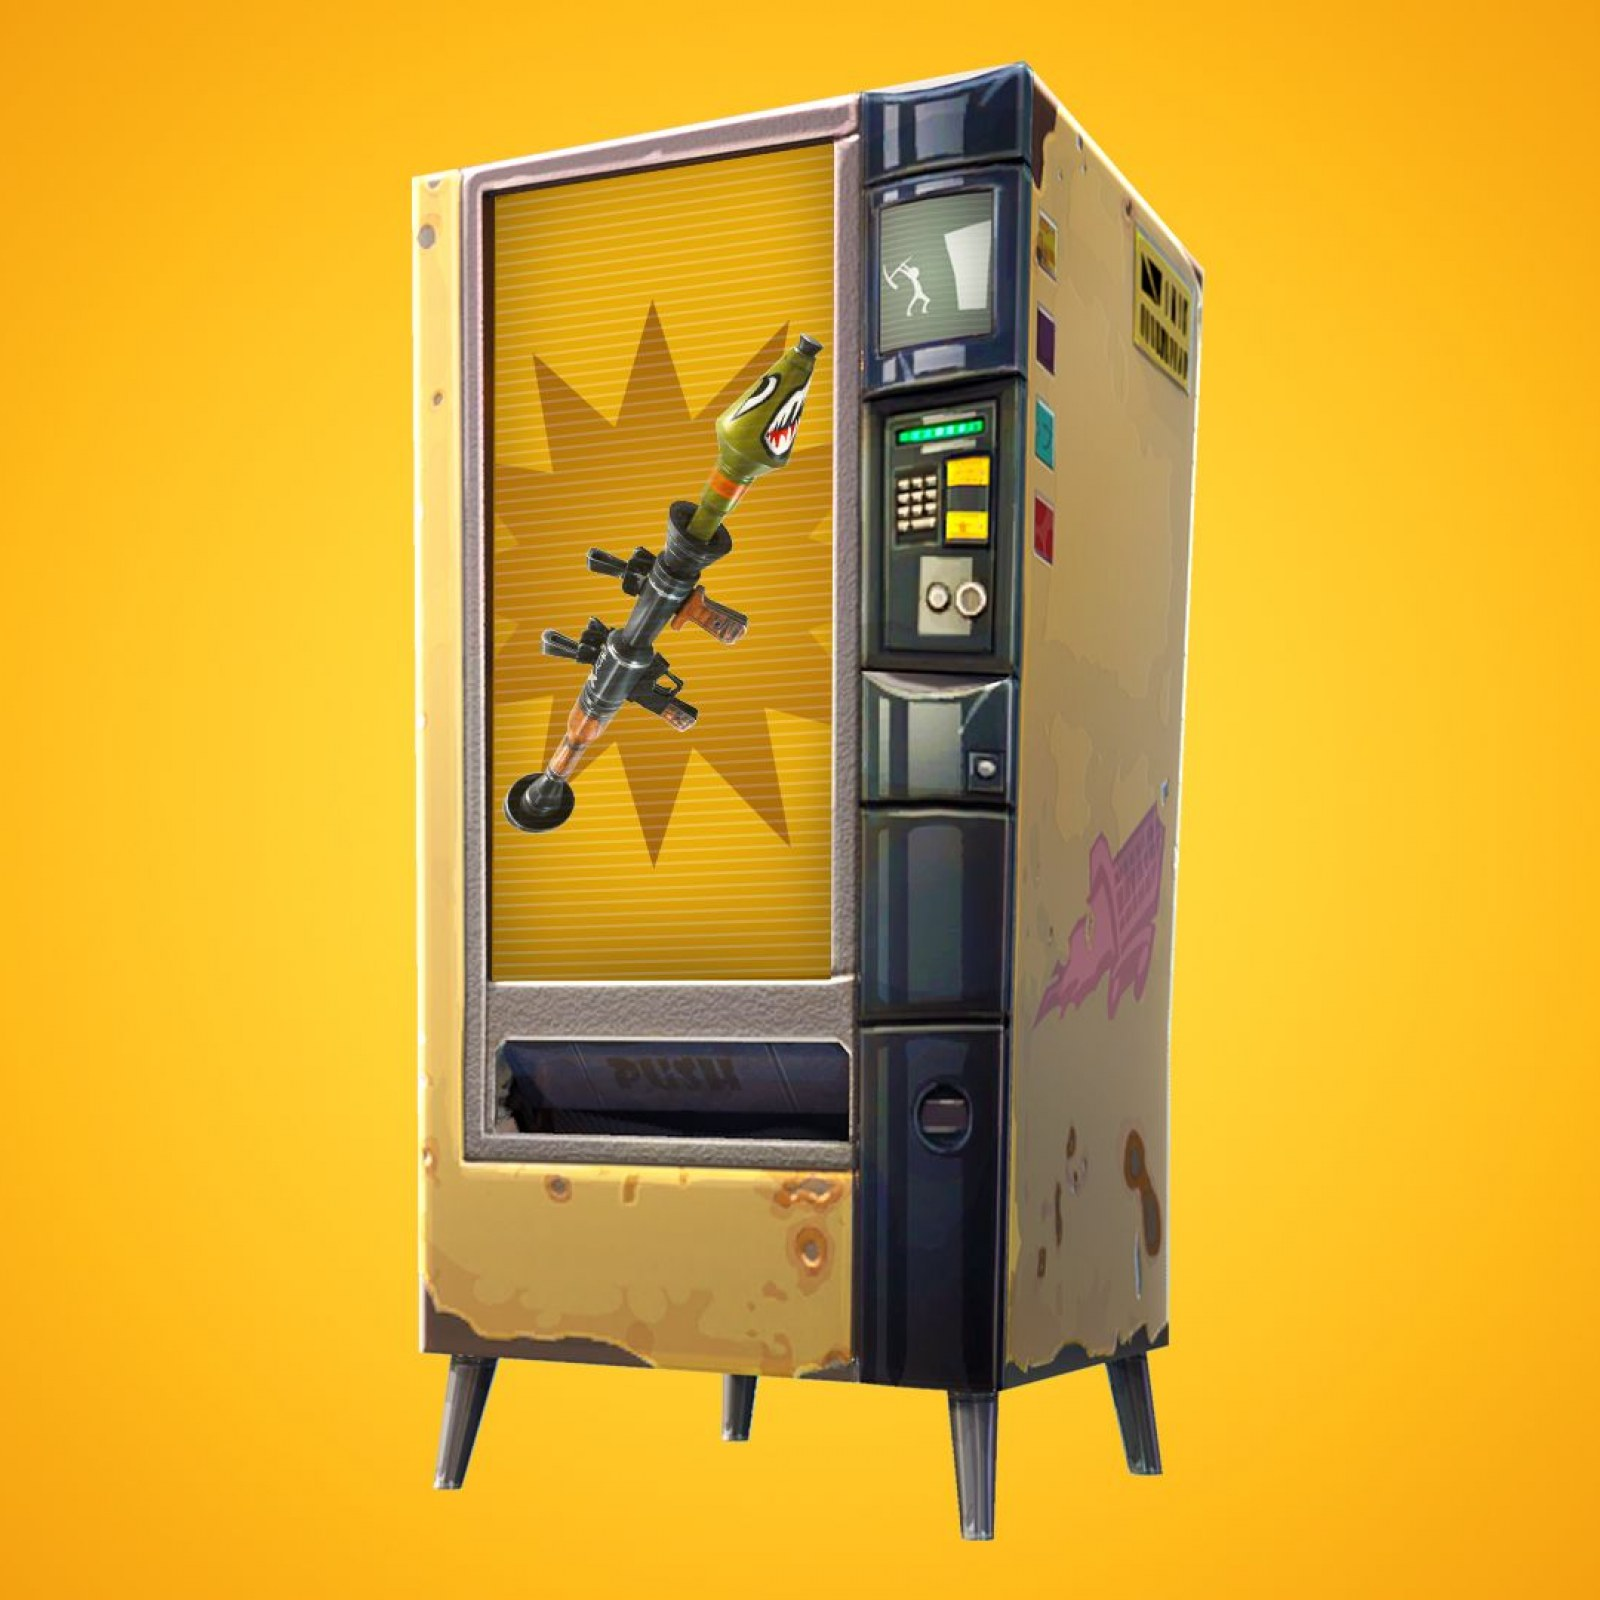 Fortnite' Update 8 10 Adds Baller & Vending Machines - Patch